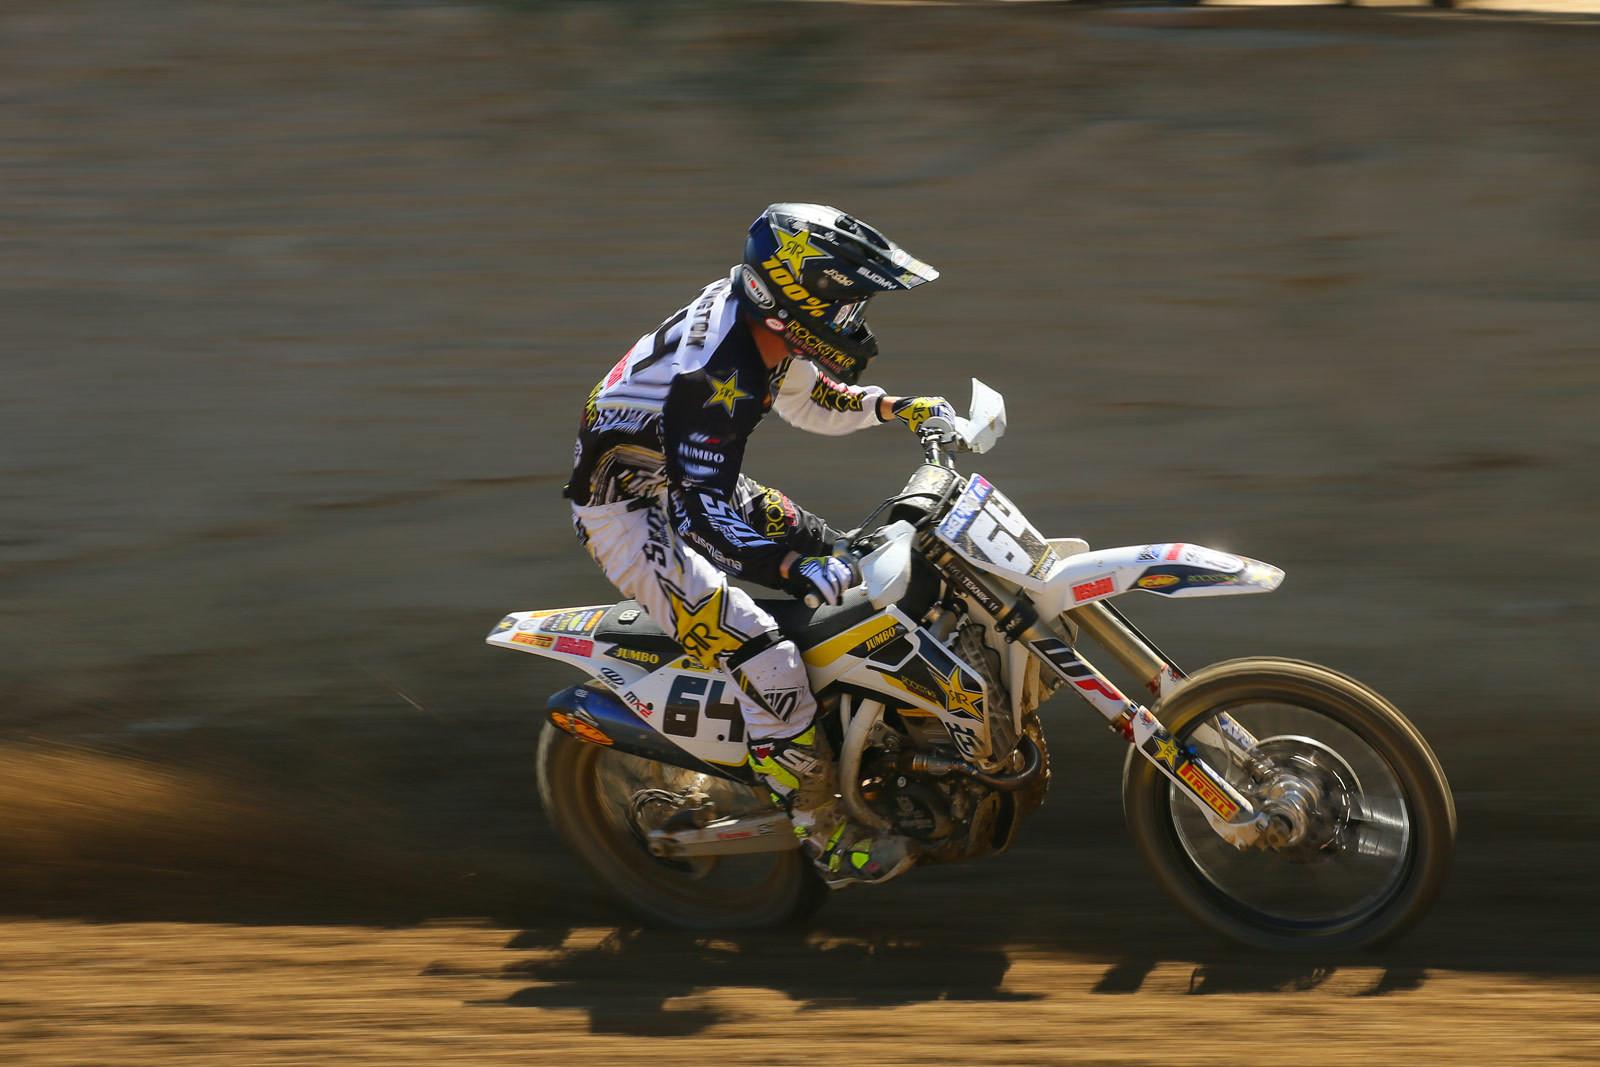 Thomas Covington - Photo Blast: MXGP of the USA - Motocross Pictures - Vital MX